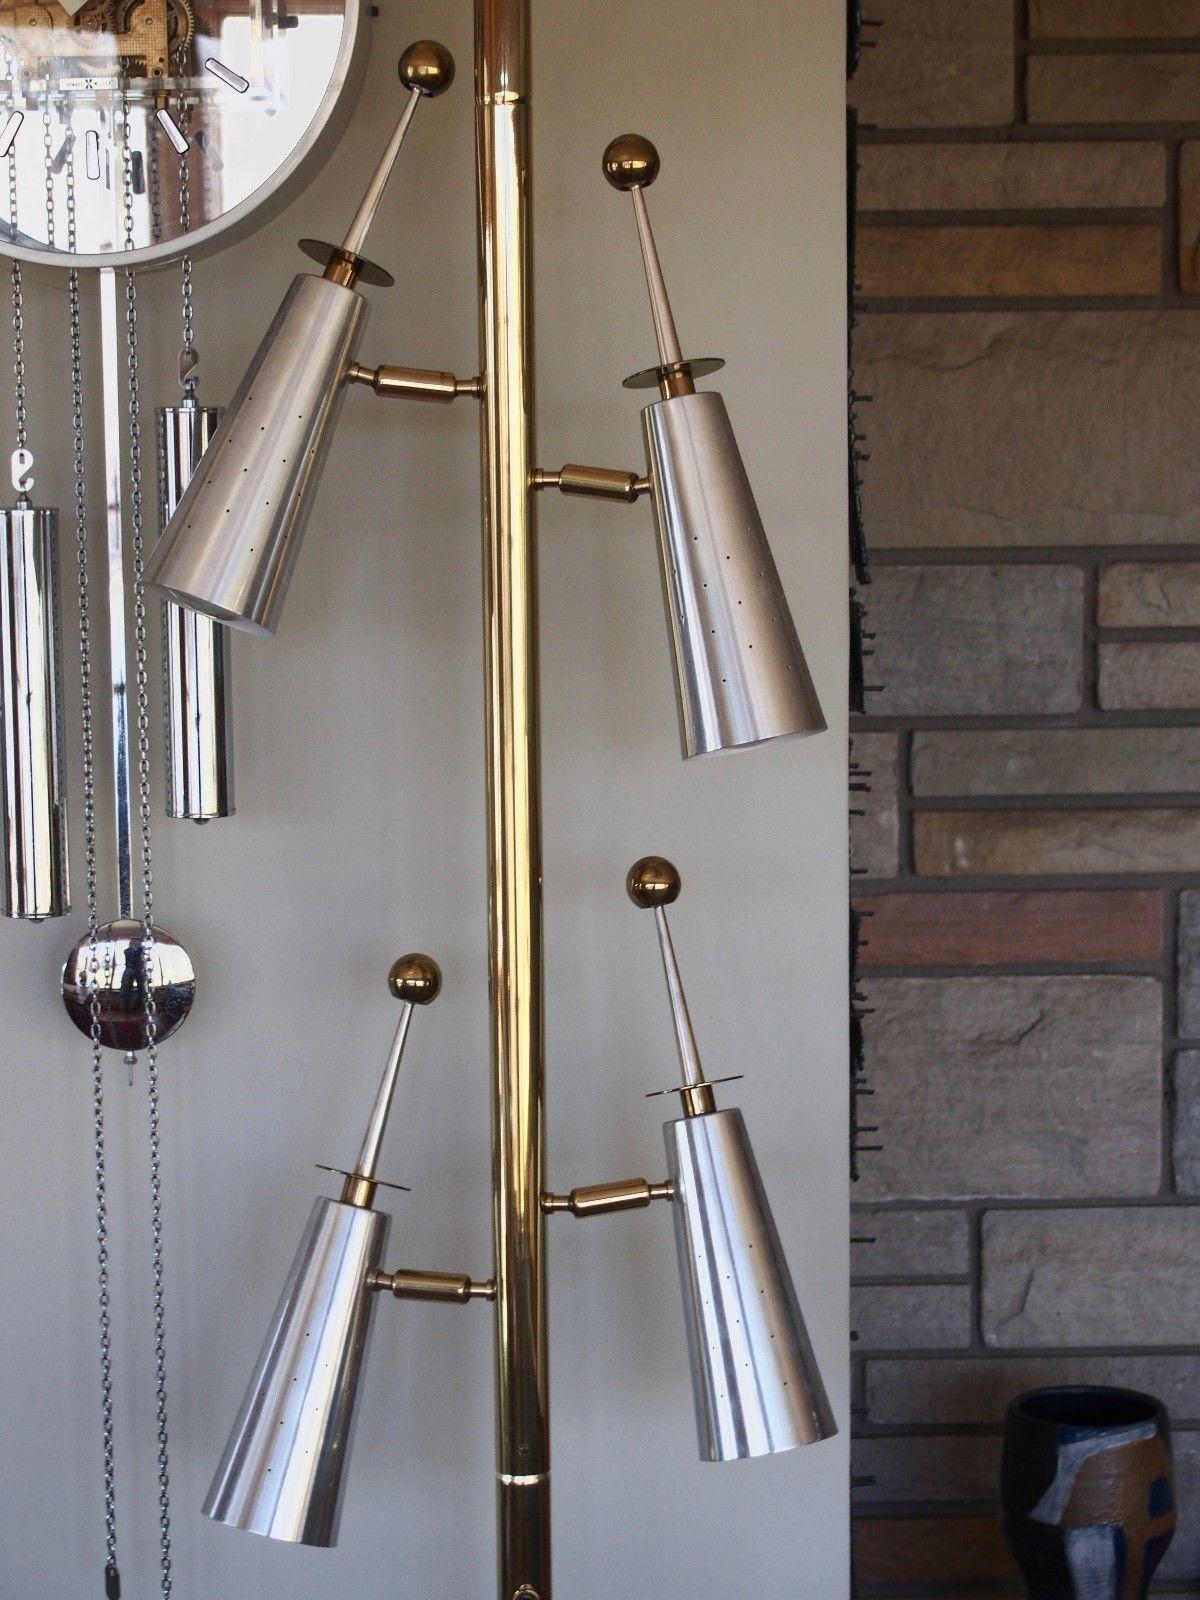 Rare Mid Century Modern Stiffel Futura Tension Floor Lamp Raymond Loewy Mid Century Modern Table Lamps Modern Table Lamp Design Mid Century Modern Lighting